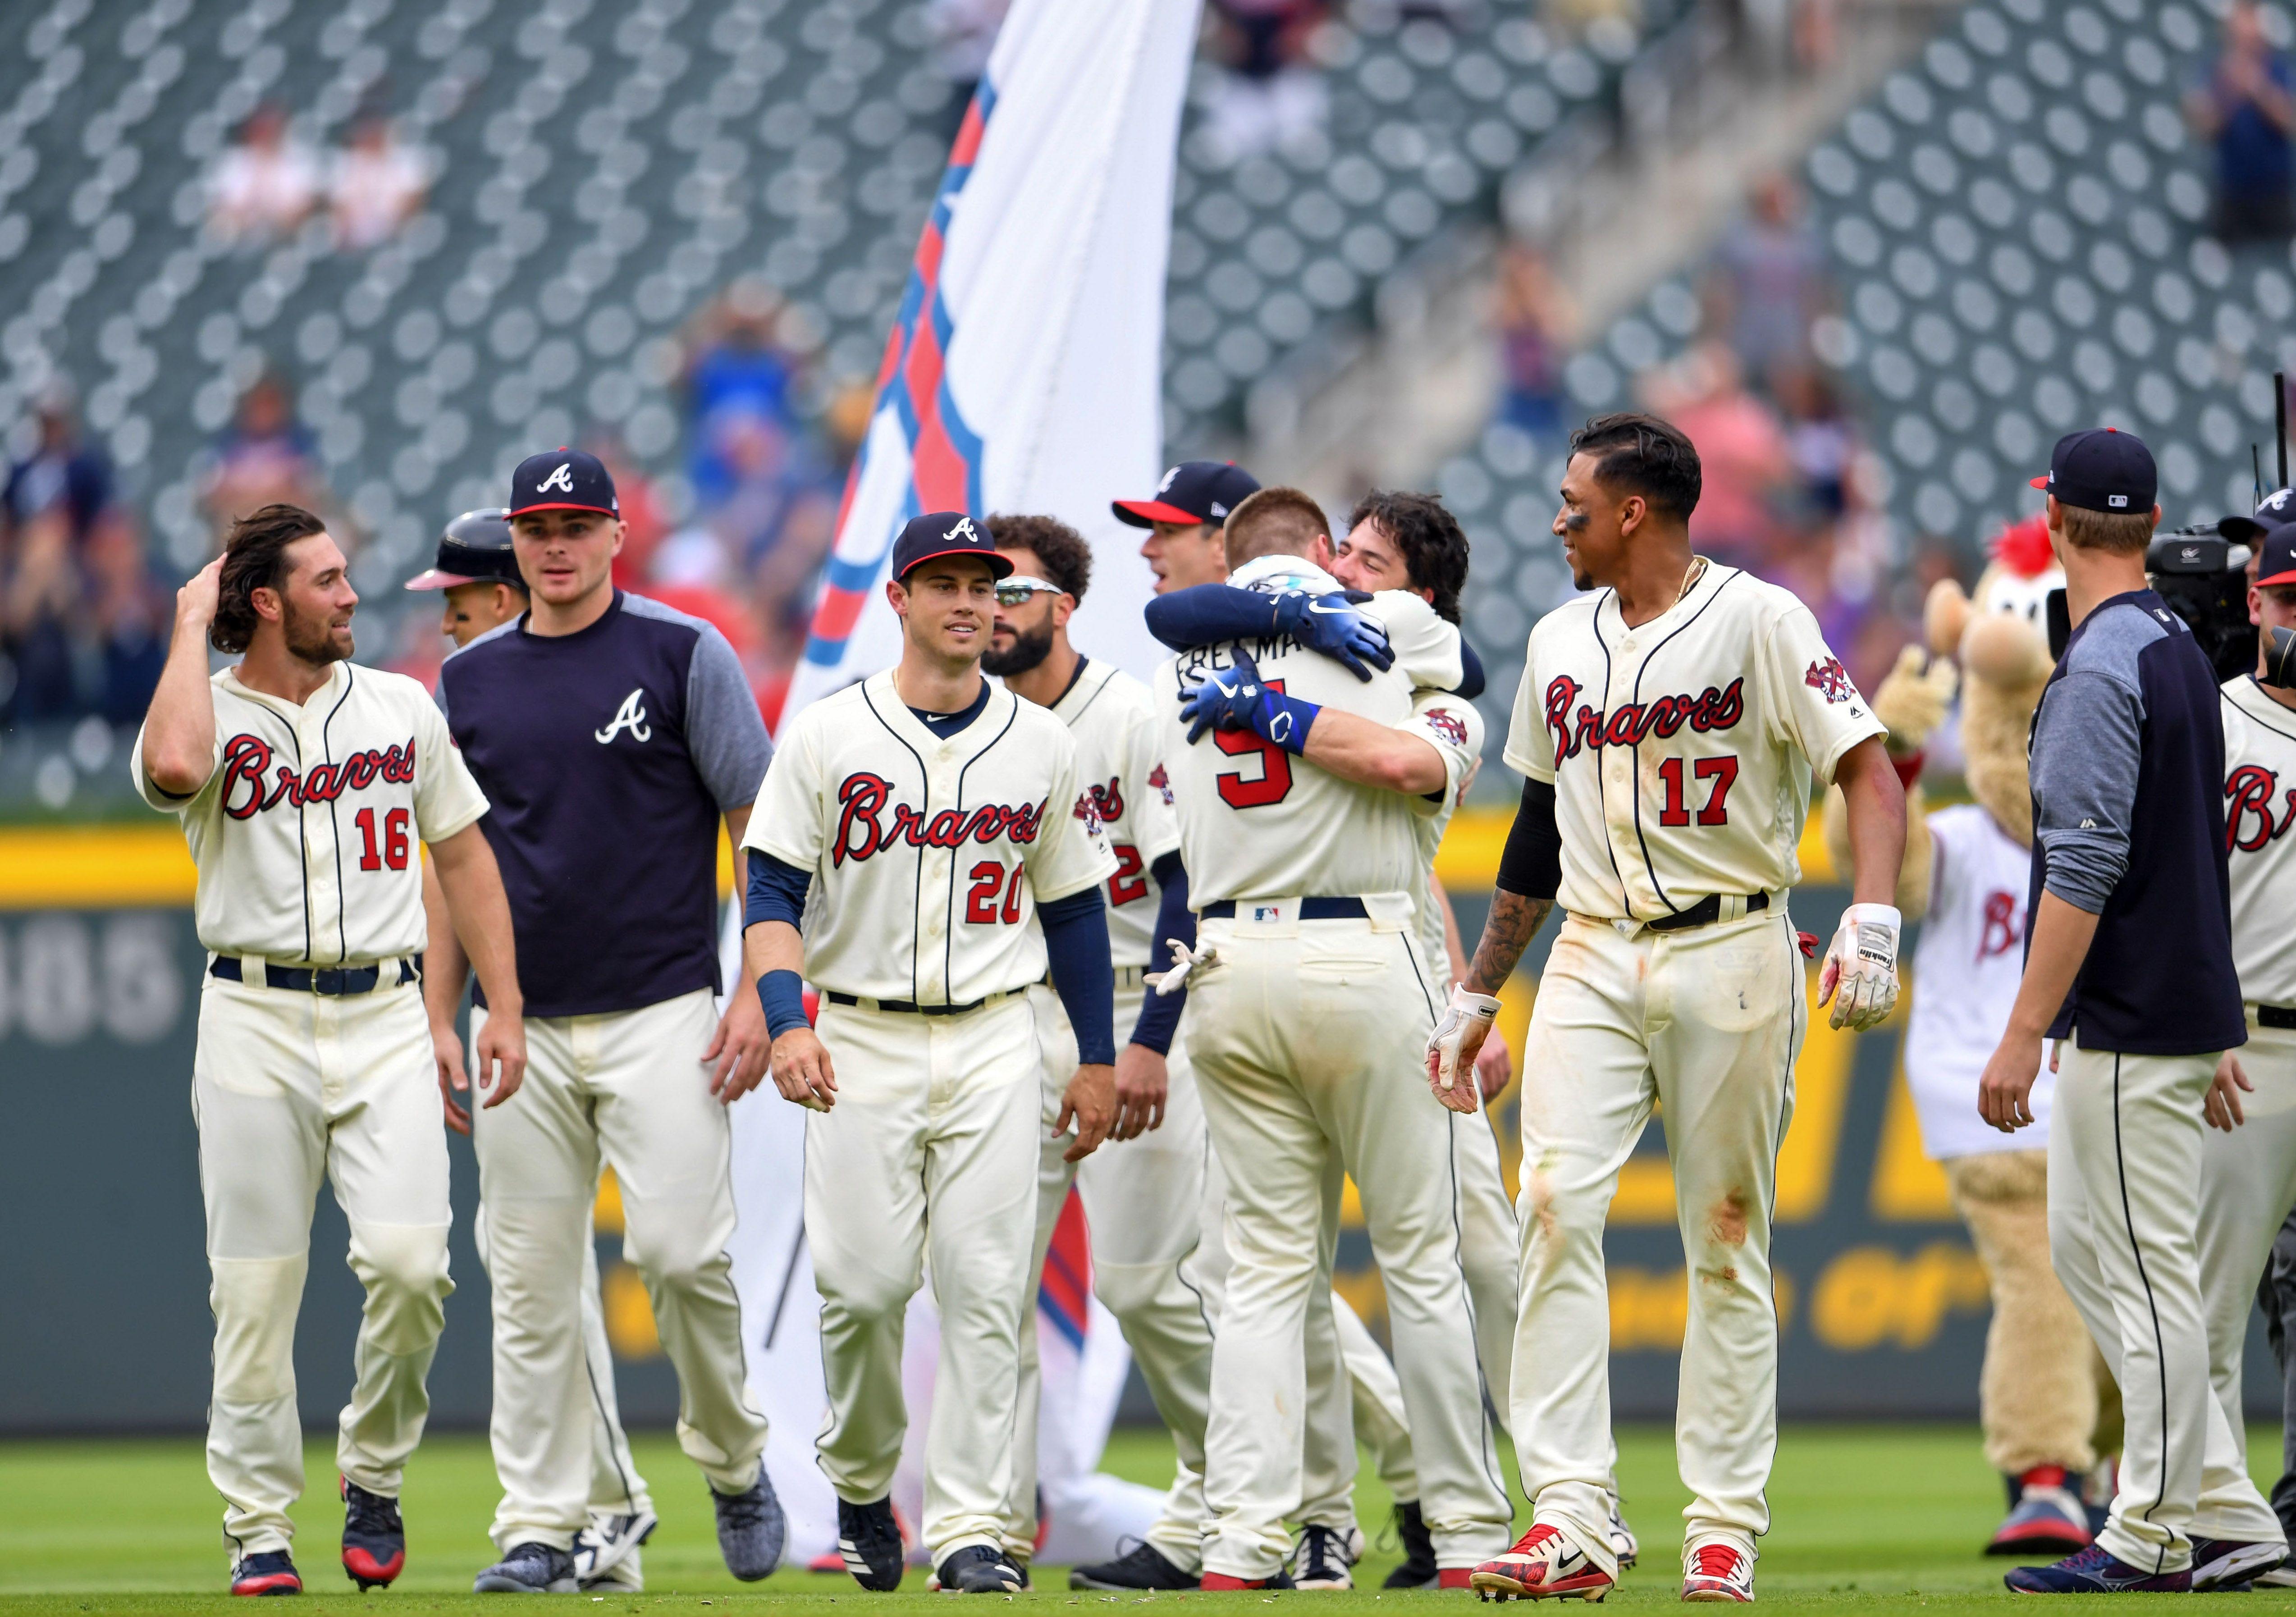 May 20 2018 Atlanta Ga Usa Atlanta Braves Shortstop Dansby Swanson 7 Hugs First Baseman Freddie Freeman 5 Braves Major League Baseball Usa Today Sports